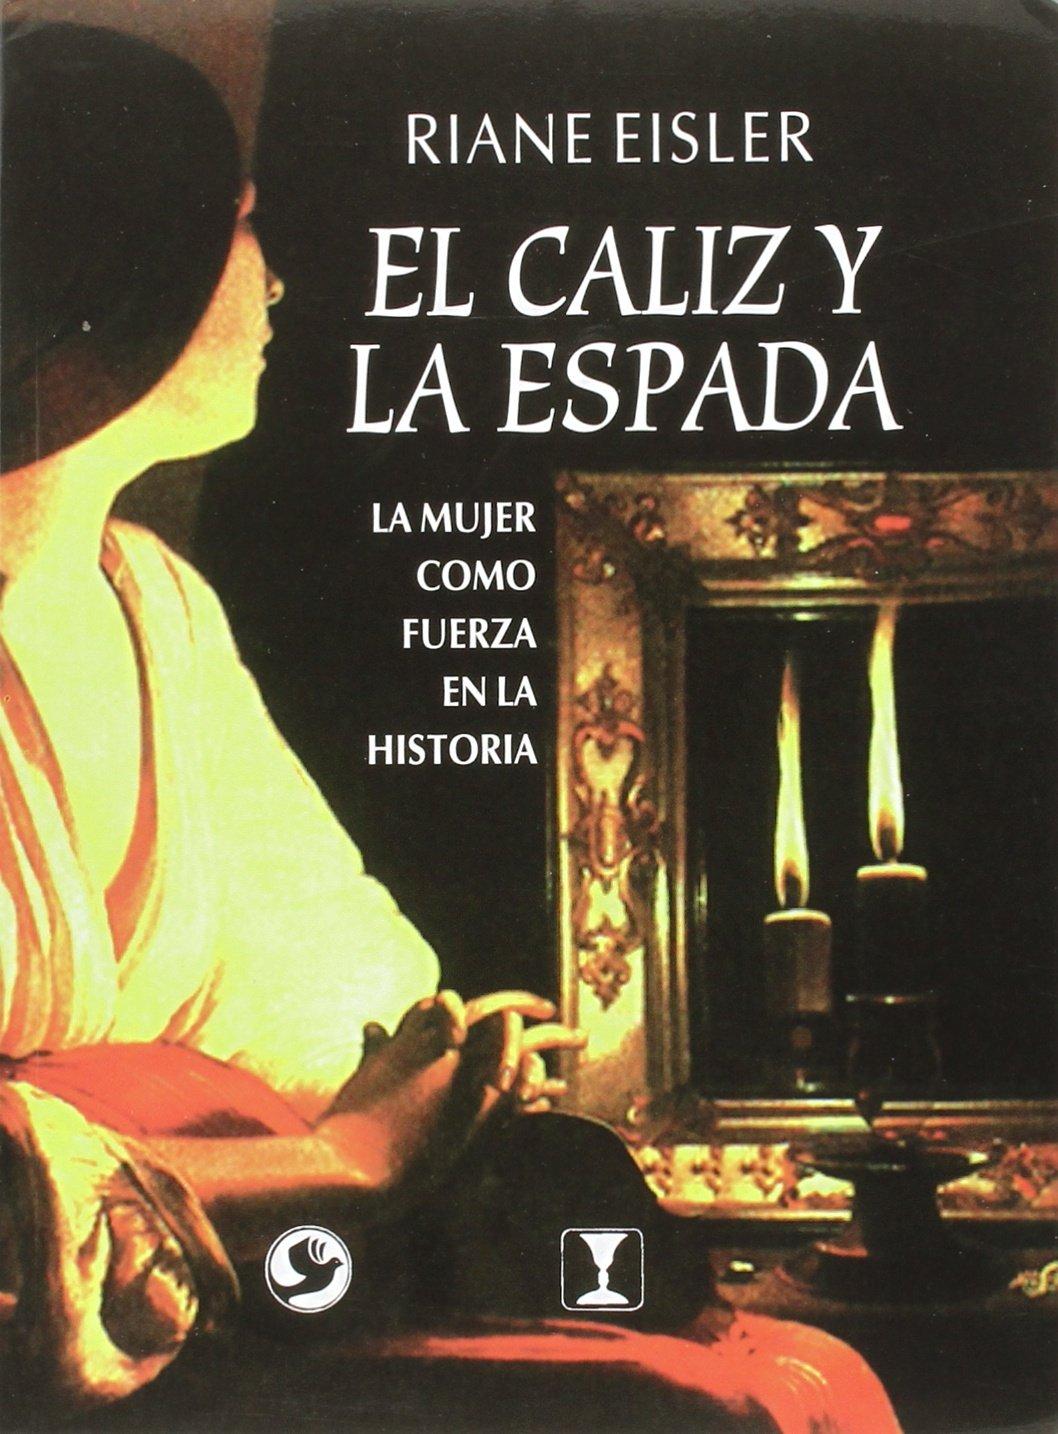 RIANE EISLER EL CALIZ Y LA ESPADA PDF